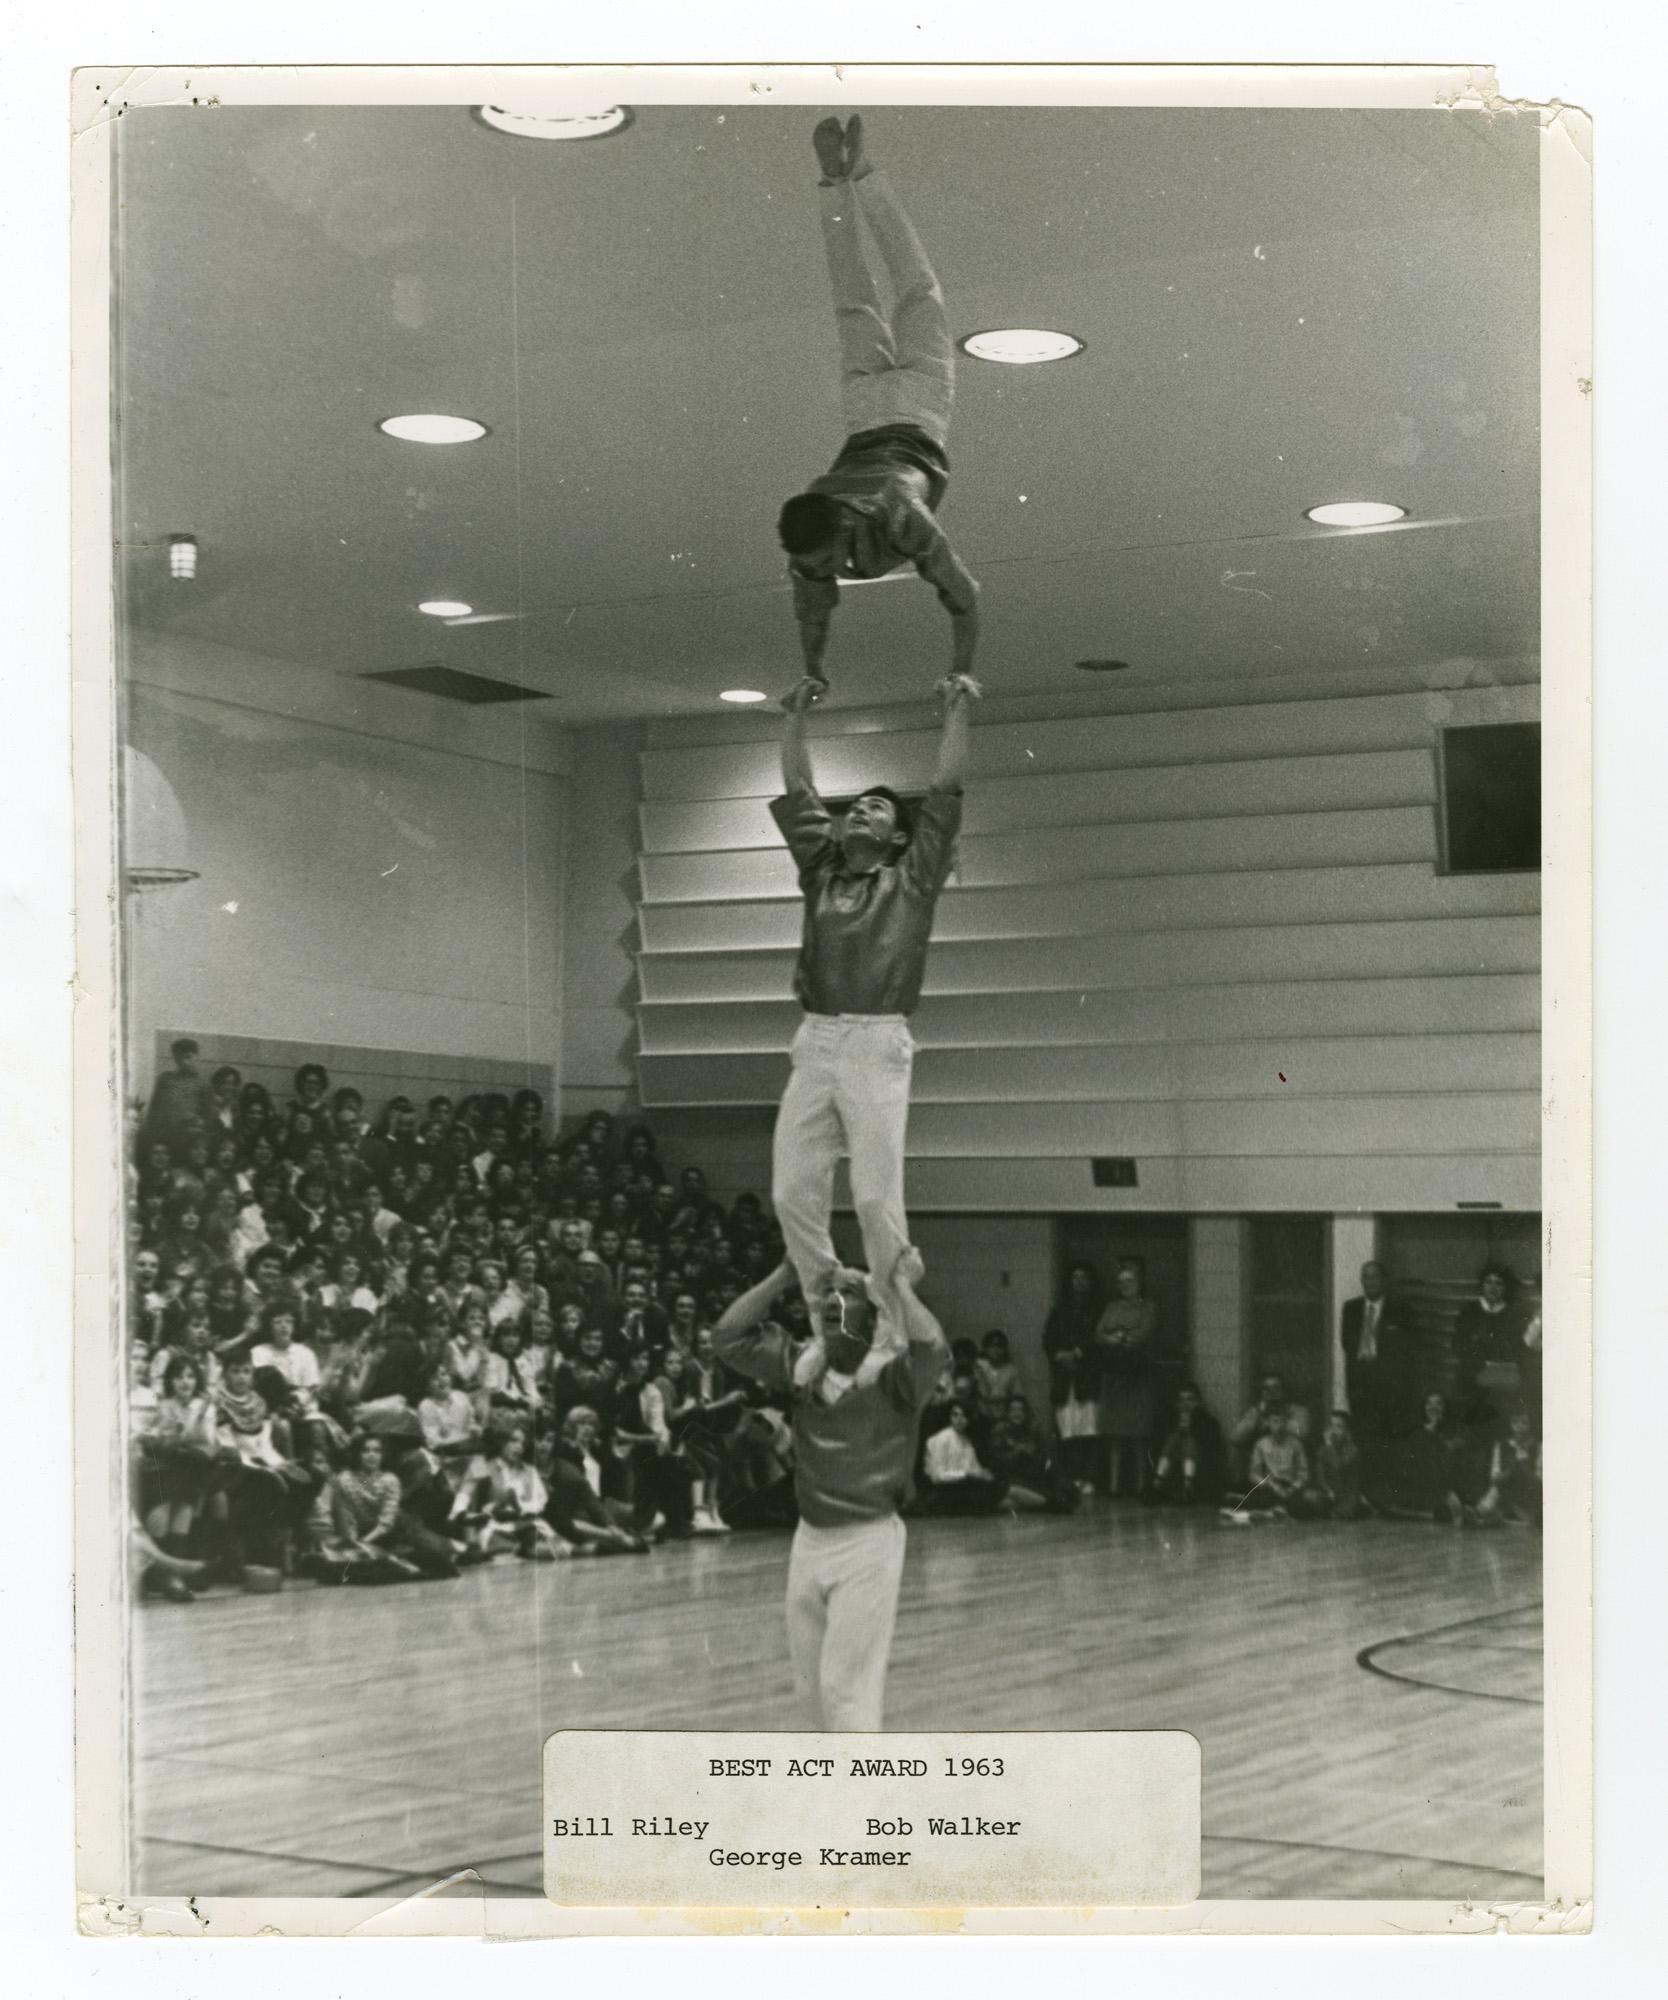 1963 - Men's Triples Balancing